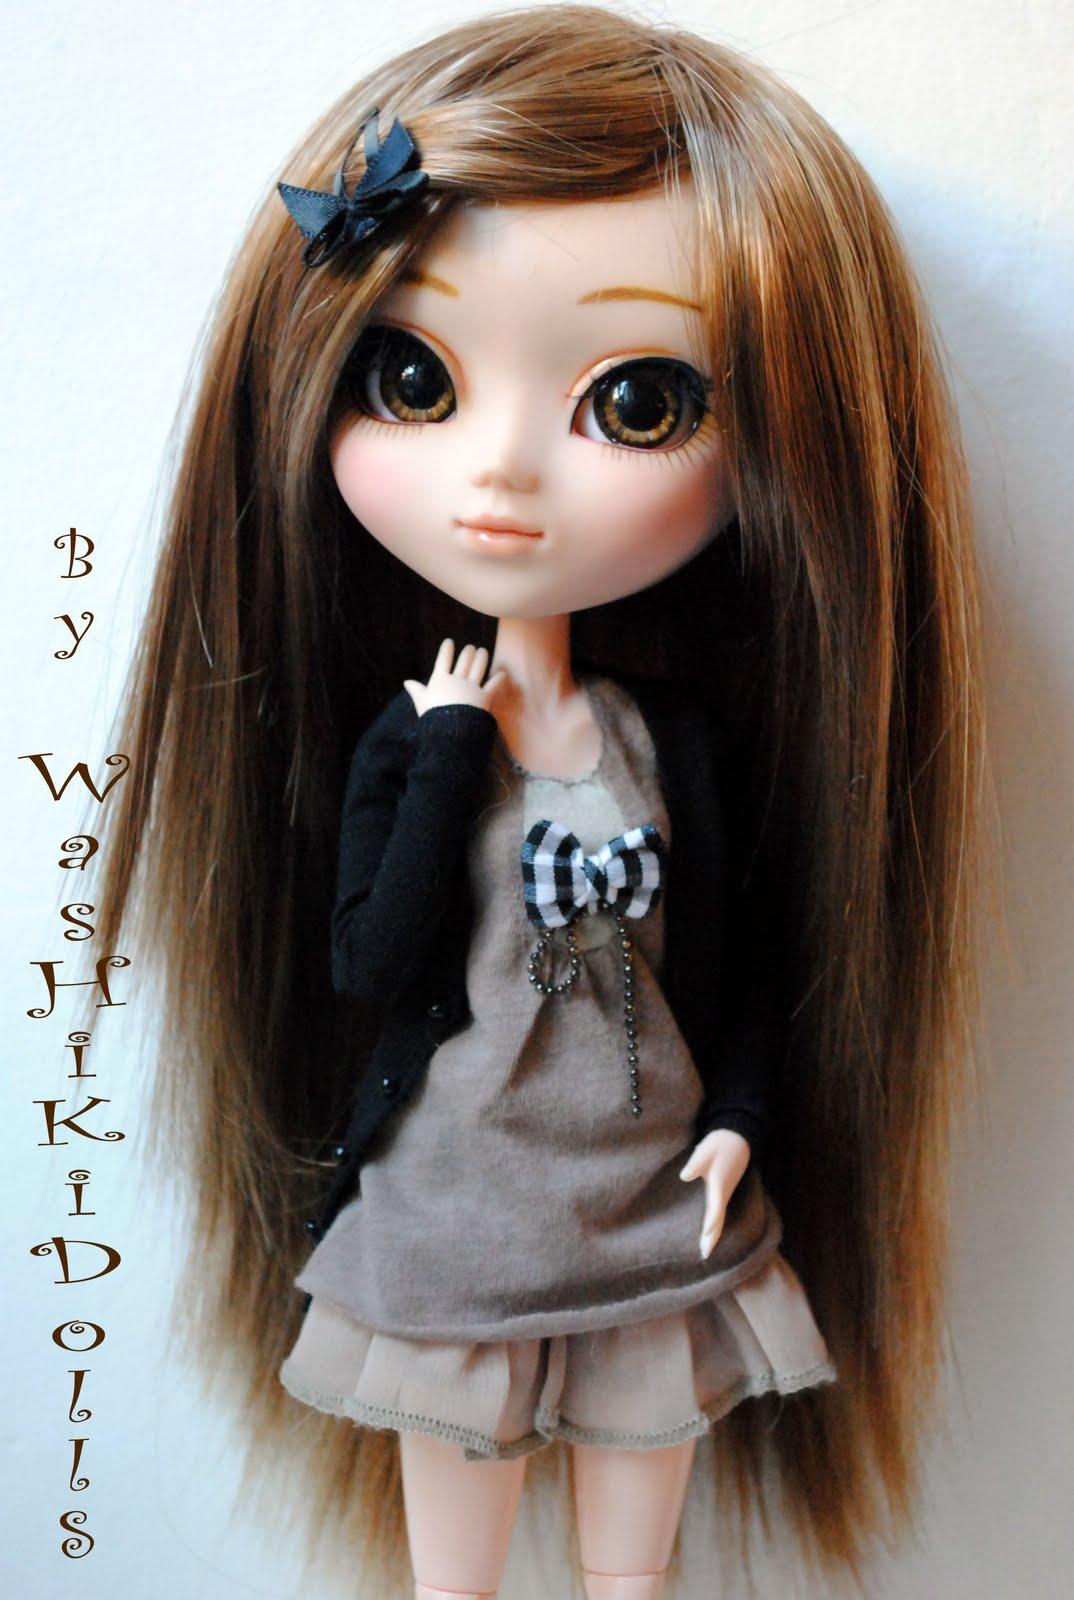 Yining's Blog: Pullip Dolls VS Blythe Dolls! - 14 APRIL ...